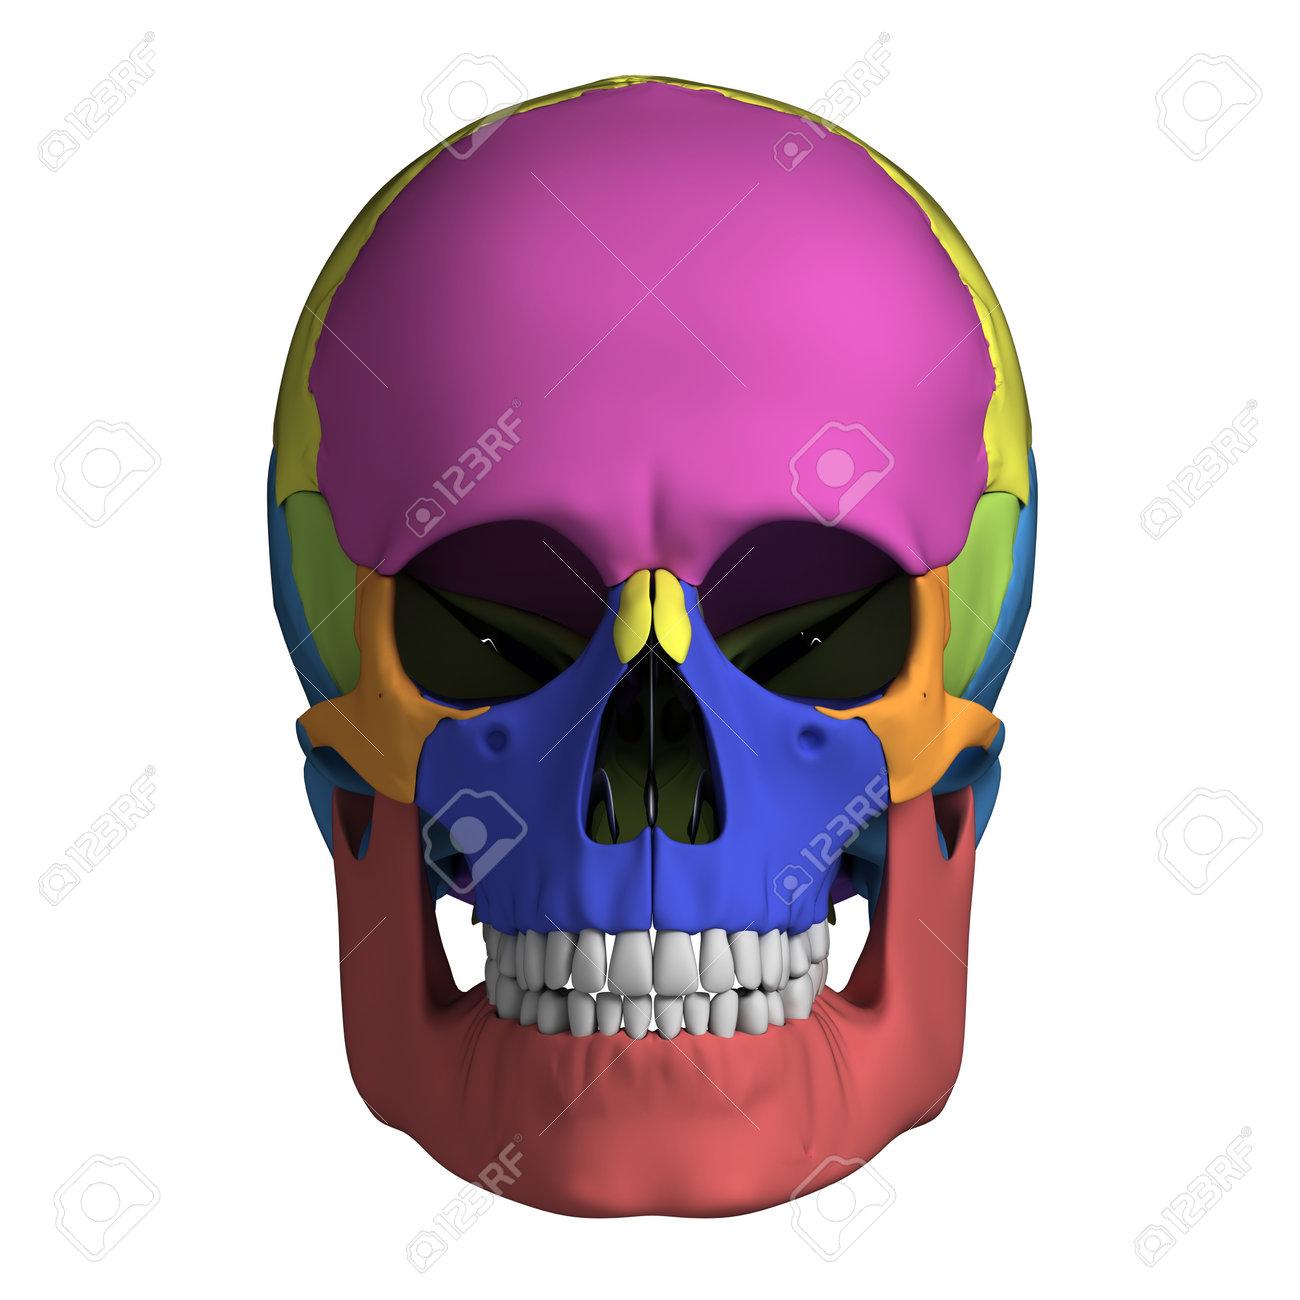 3d Rendered Illustration Human Skull Anatomy Stock Photo Picture